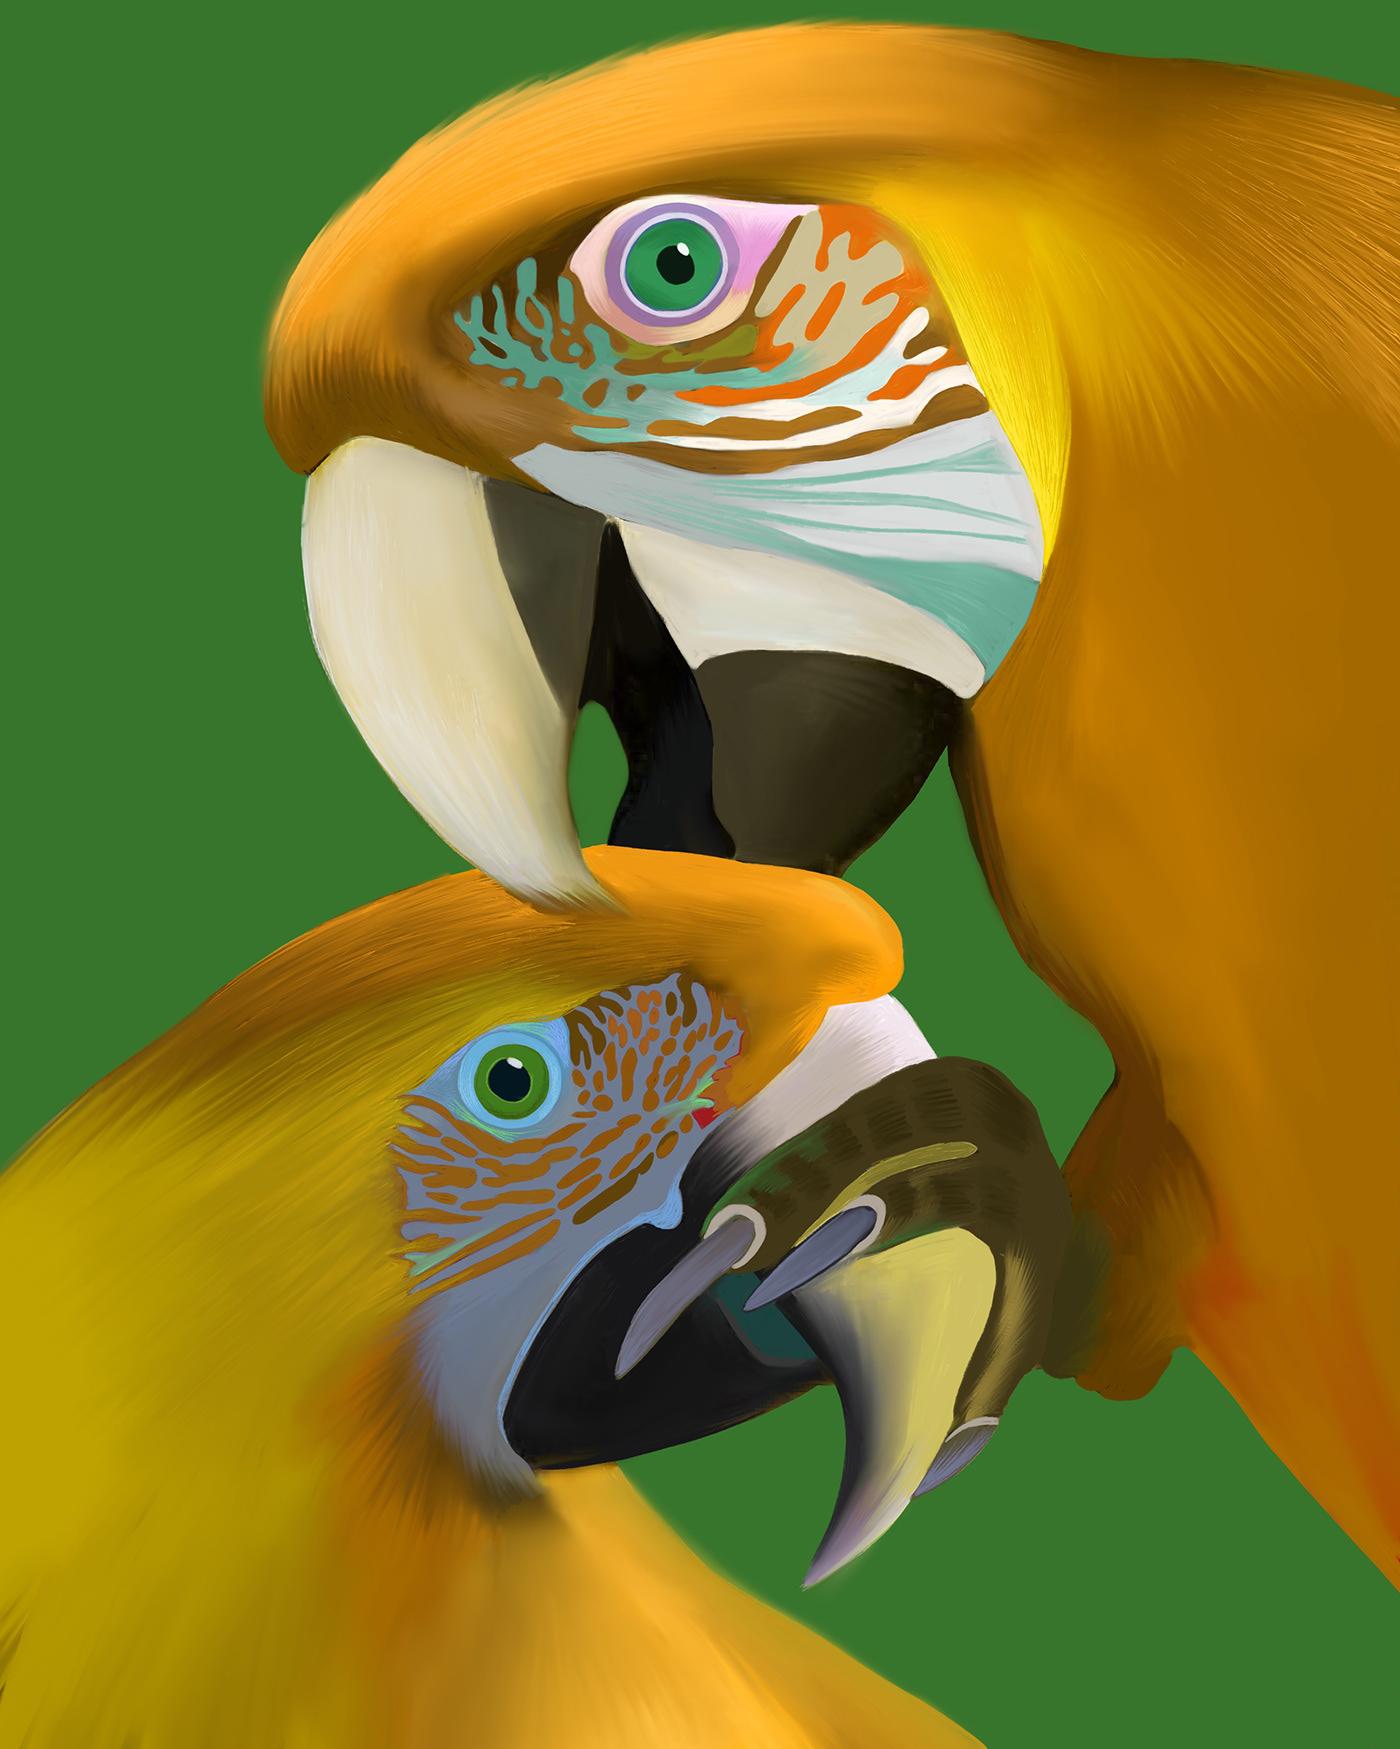 animalart digitalart Digitalartist ILLUSTRATION  procreateart Quarantine selfisolation